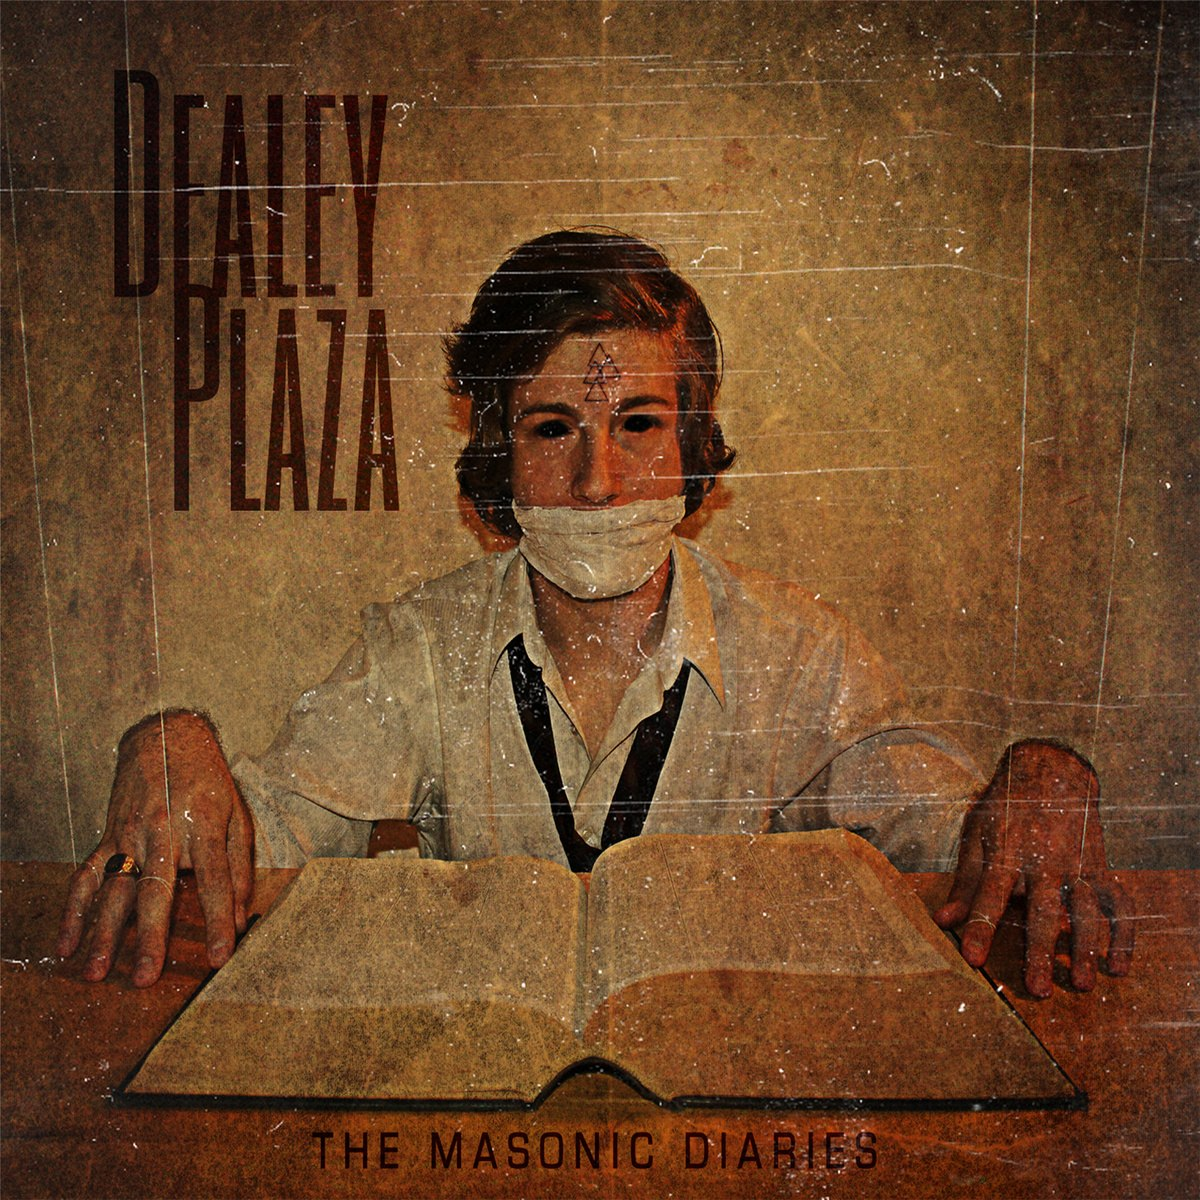 Dealey Plaza - The Masonic Diaries (2013)